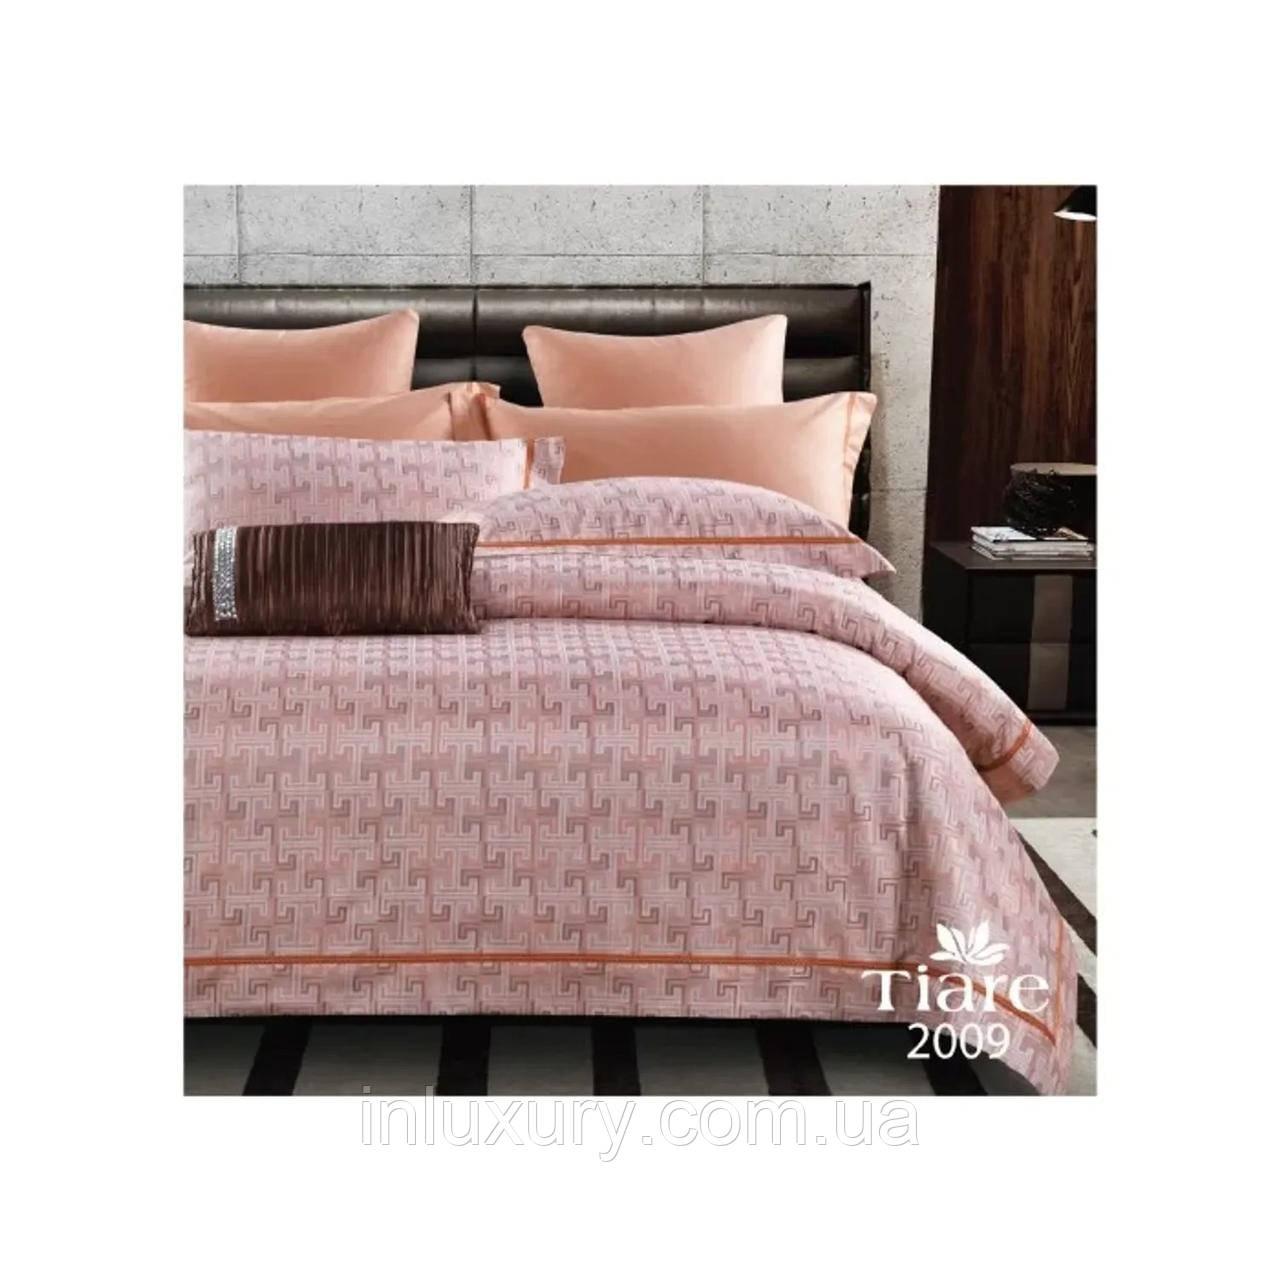 Комплект постельного белья Сатин Жаккард 2009 Tiare™